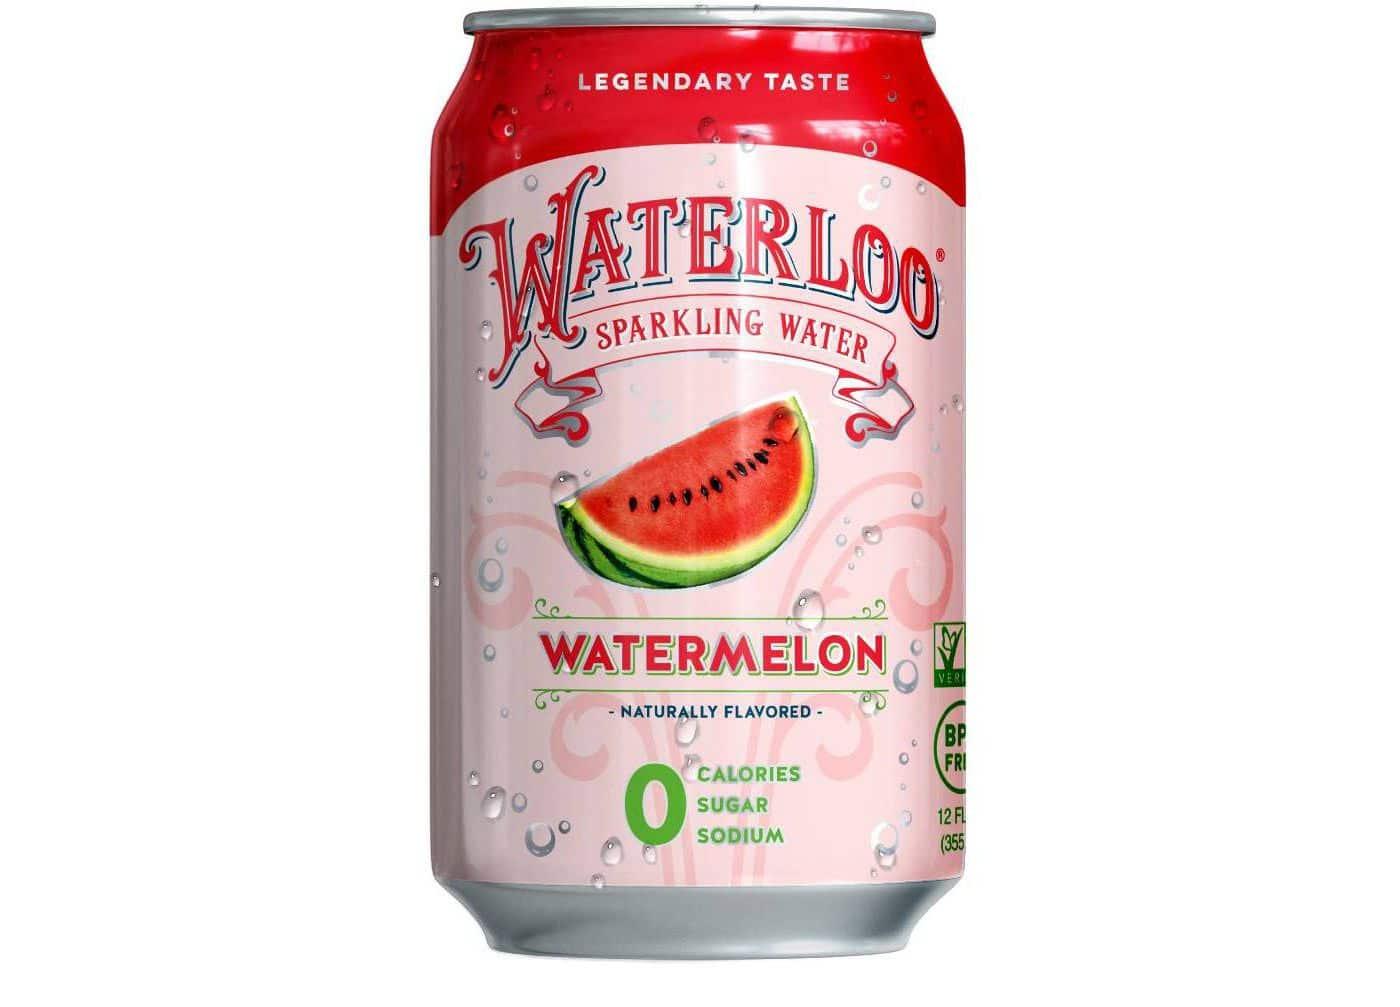 Waterloo Watermelon Sparkling Water